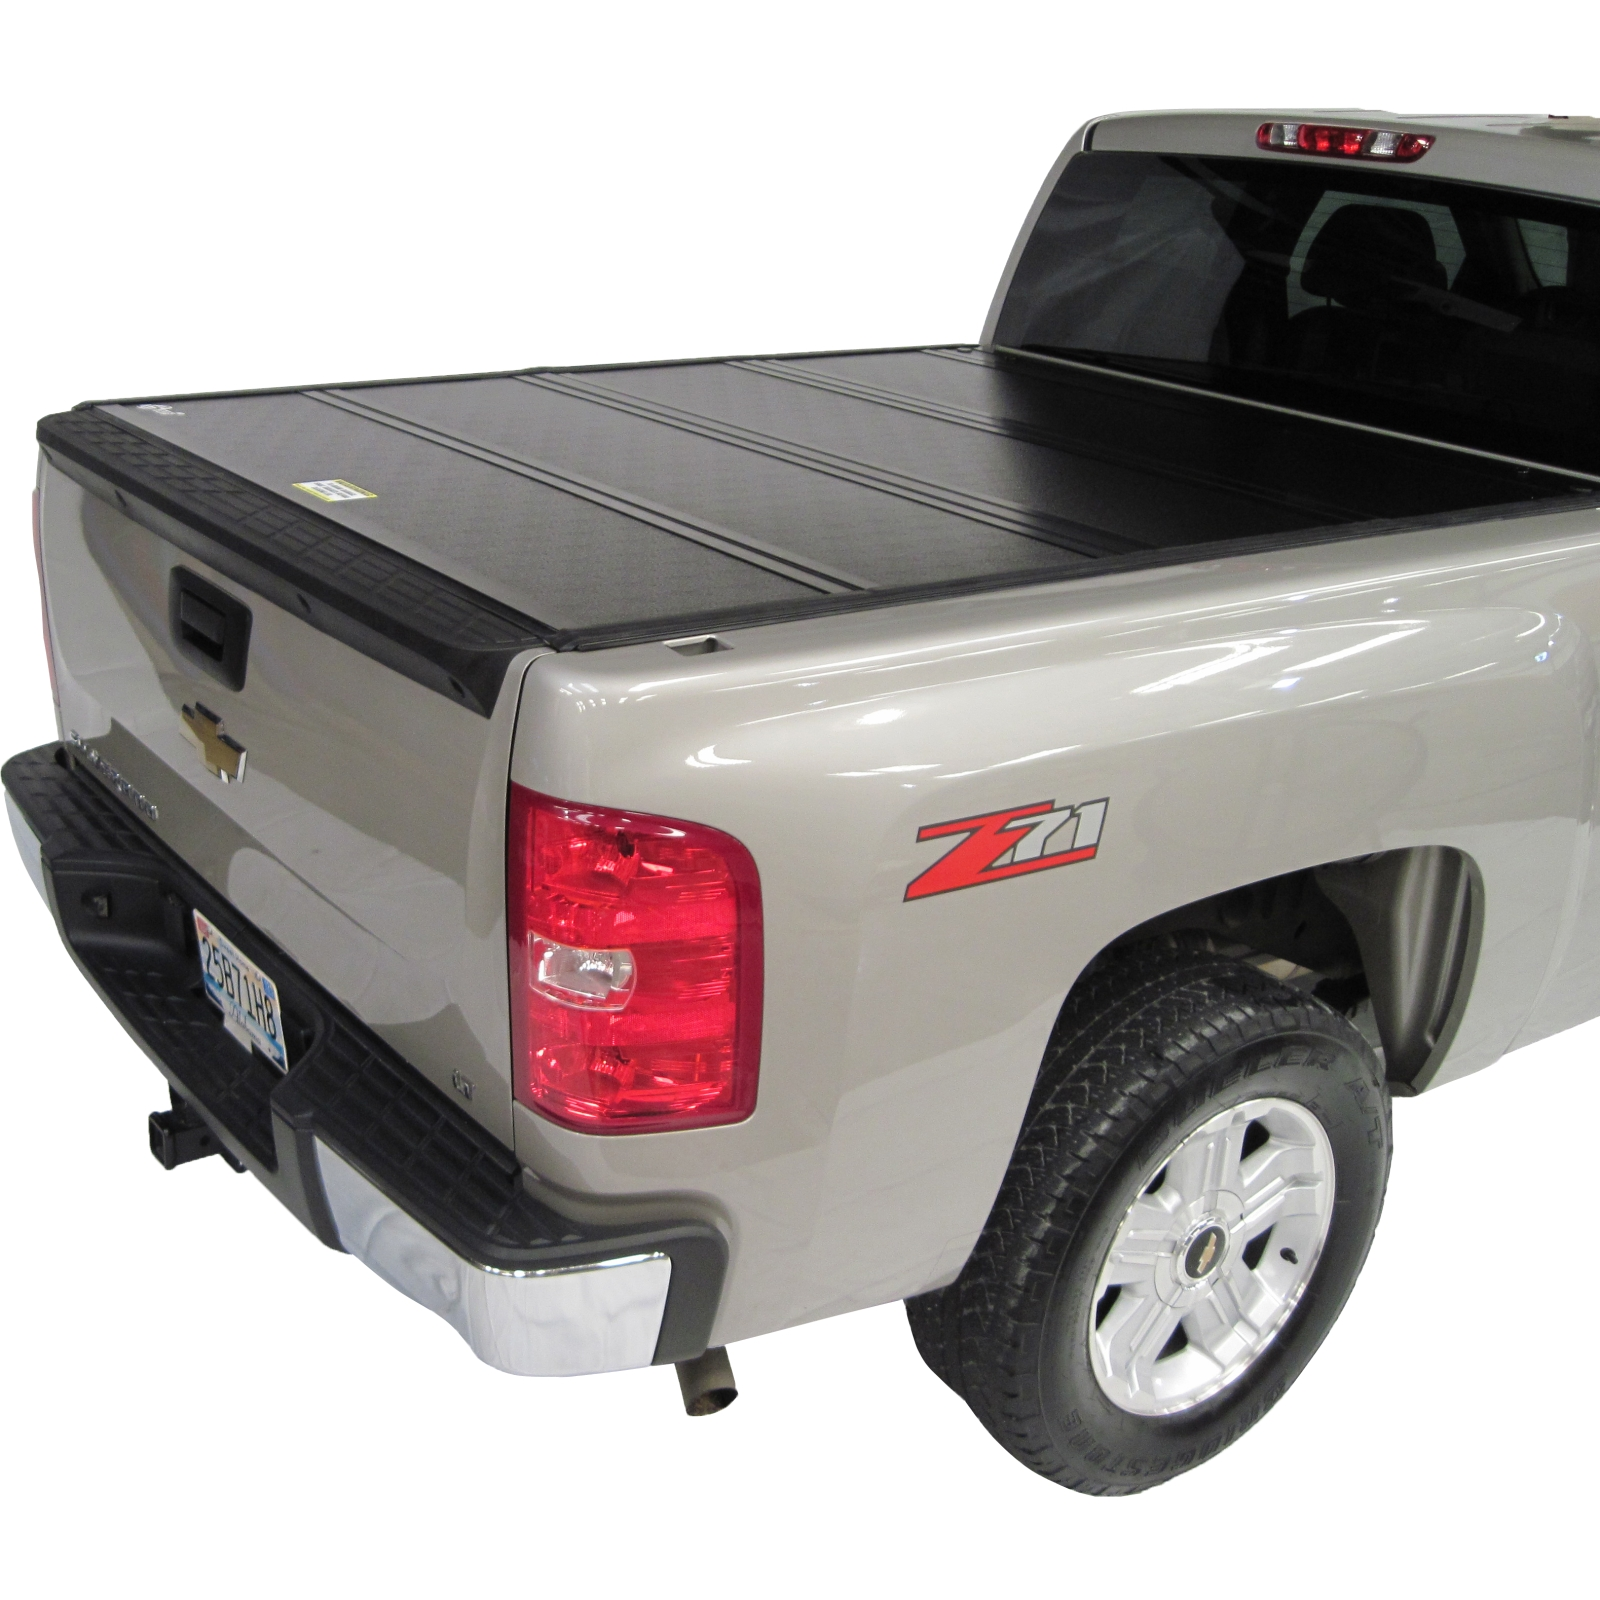 "Dodge Bed Covers: 26207 BAKFlip G2 Tonneau Cover Dodge Ram 1500 5'7"" Bed"